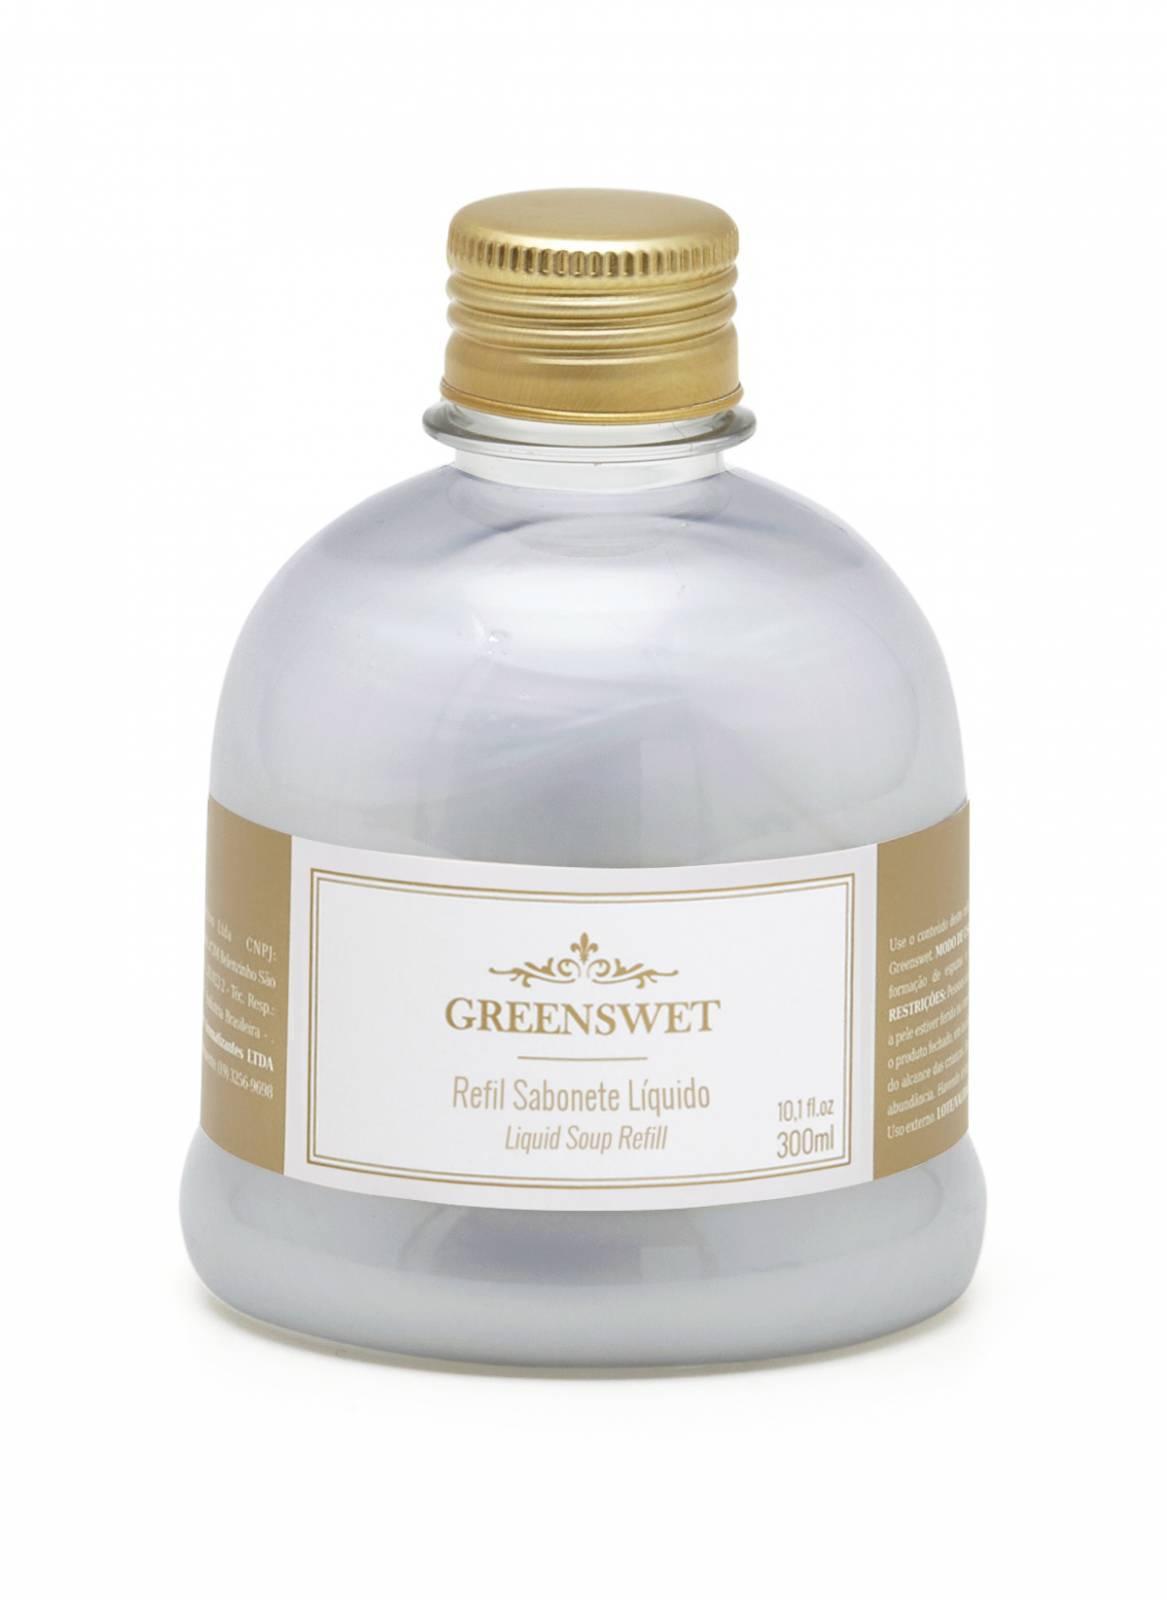 Refil Sabonete Liquido 300 ml Essência Lavanda - Greenswet Aromatizantes